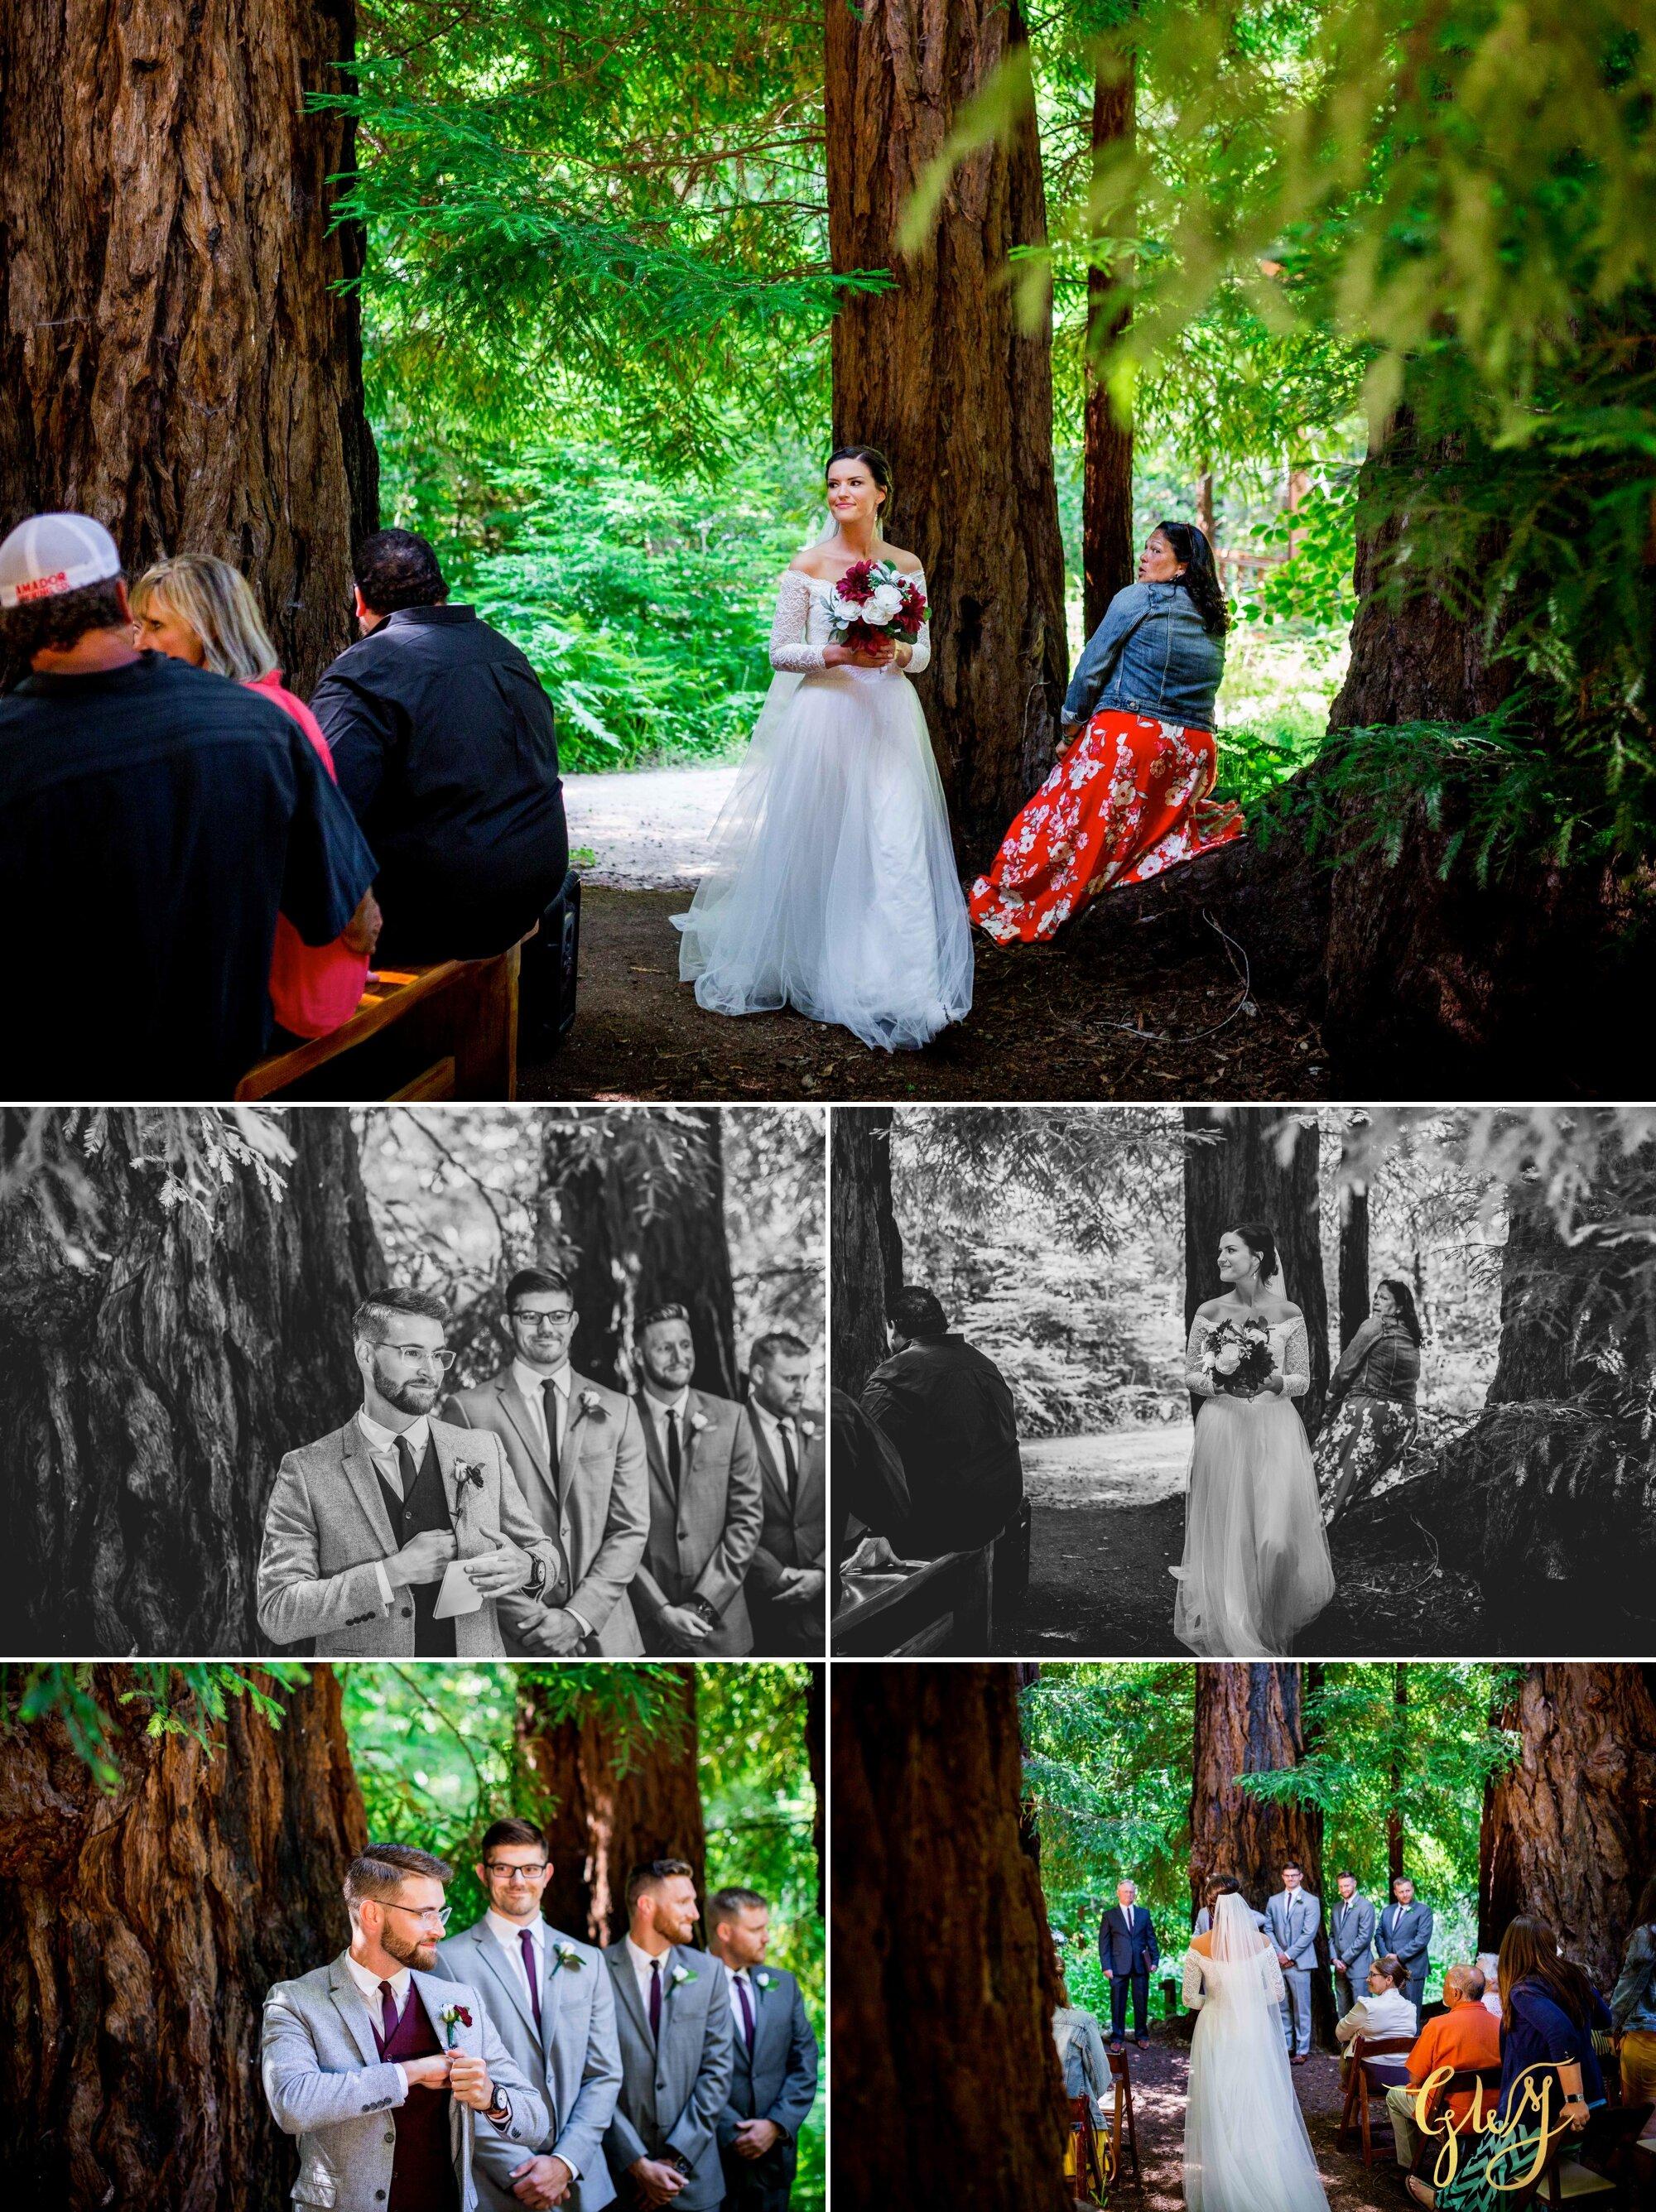 Casey + Jordan's Intimate Big Sur Elopement in the Redwoods by Glass Woods Media 32.jpg